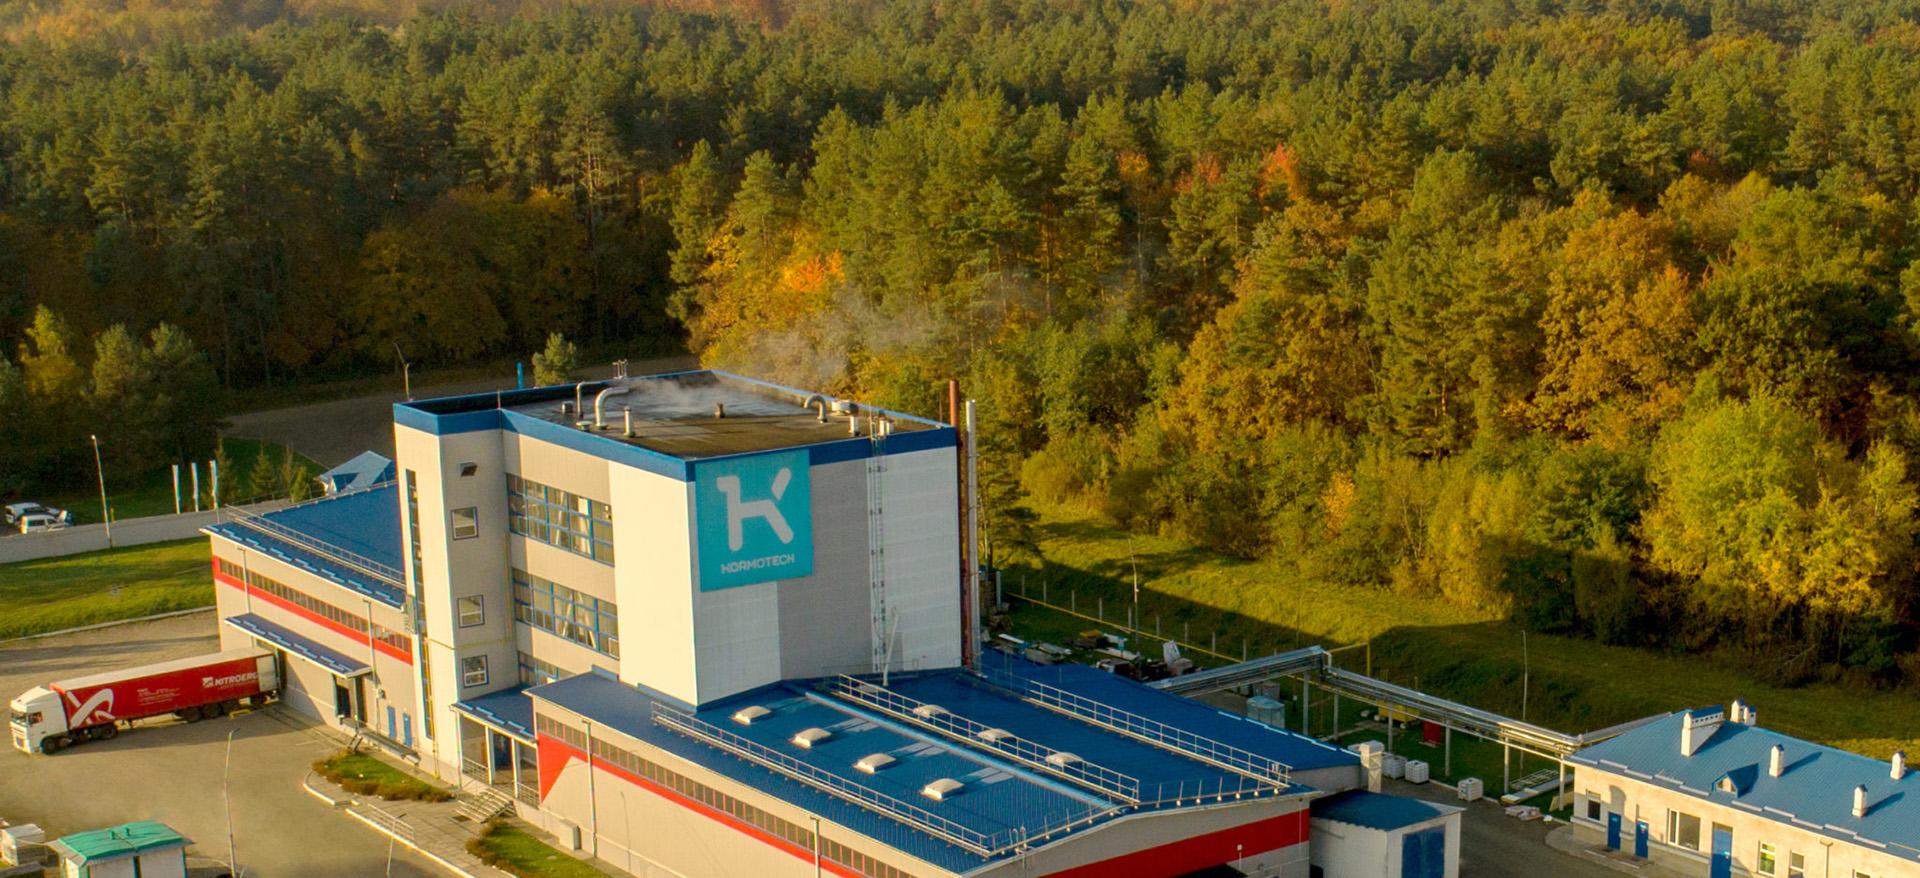 Кormotech, animal feed production plant